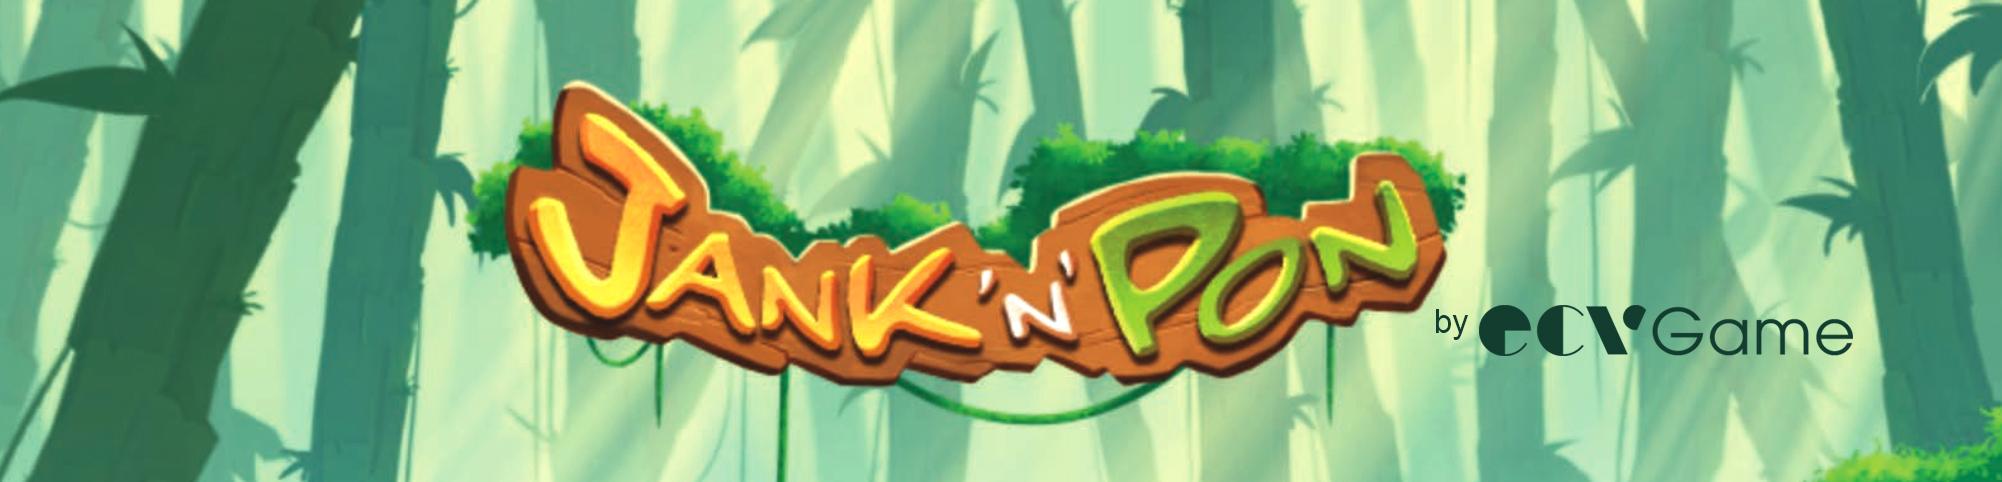 Jank 'n' Pon